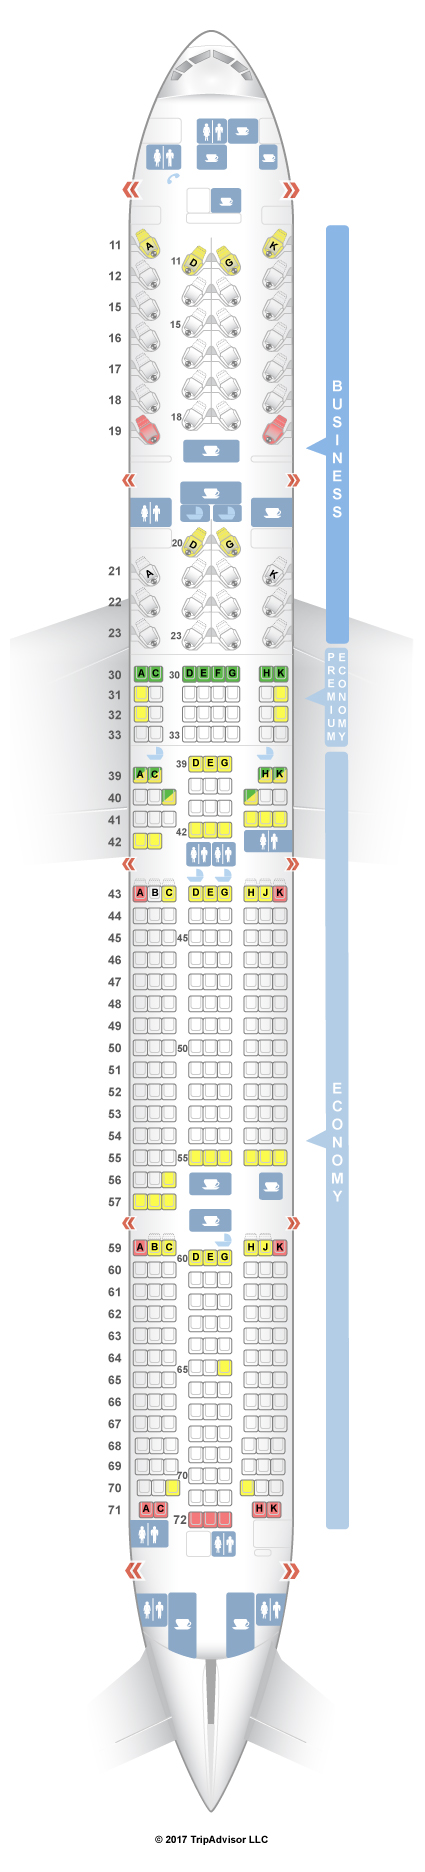 Cathay Pacific Seat Map SeatGuru Seat Map Cathay Pacific Boeing 777 300ER (77G) Three Class Cathay Pacific Seat Map